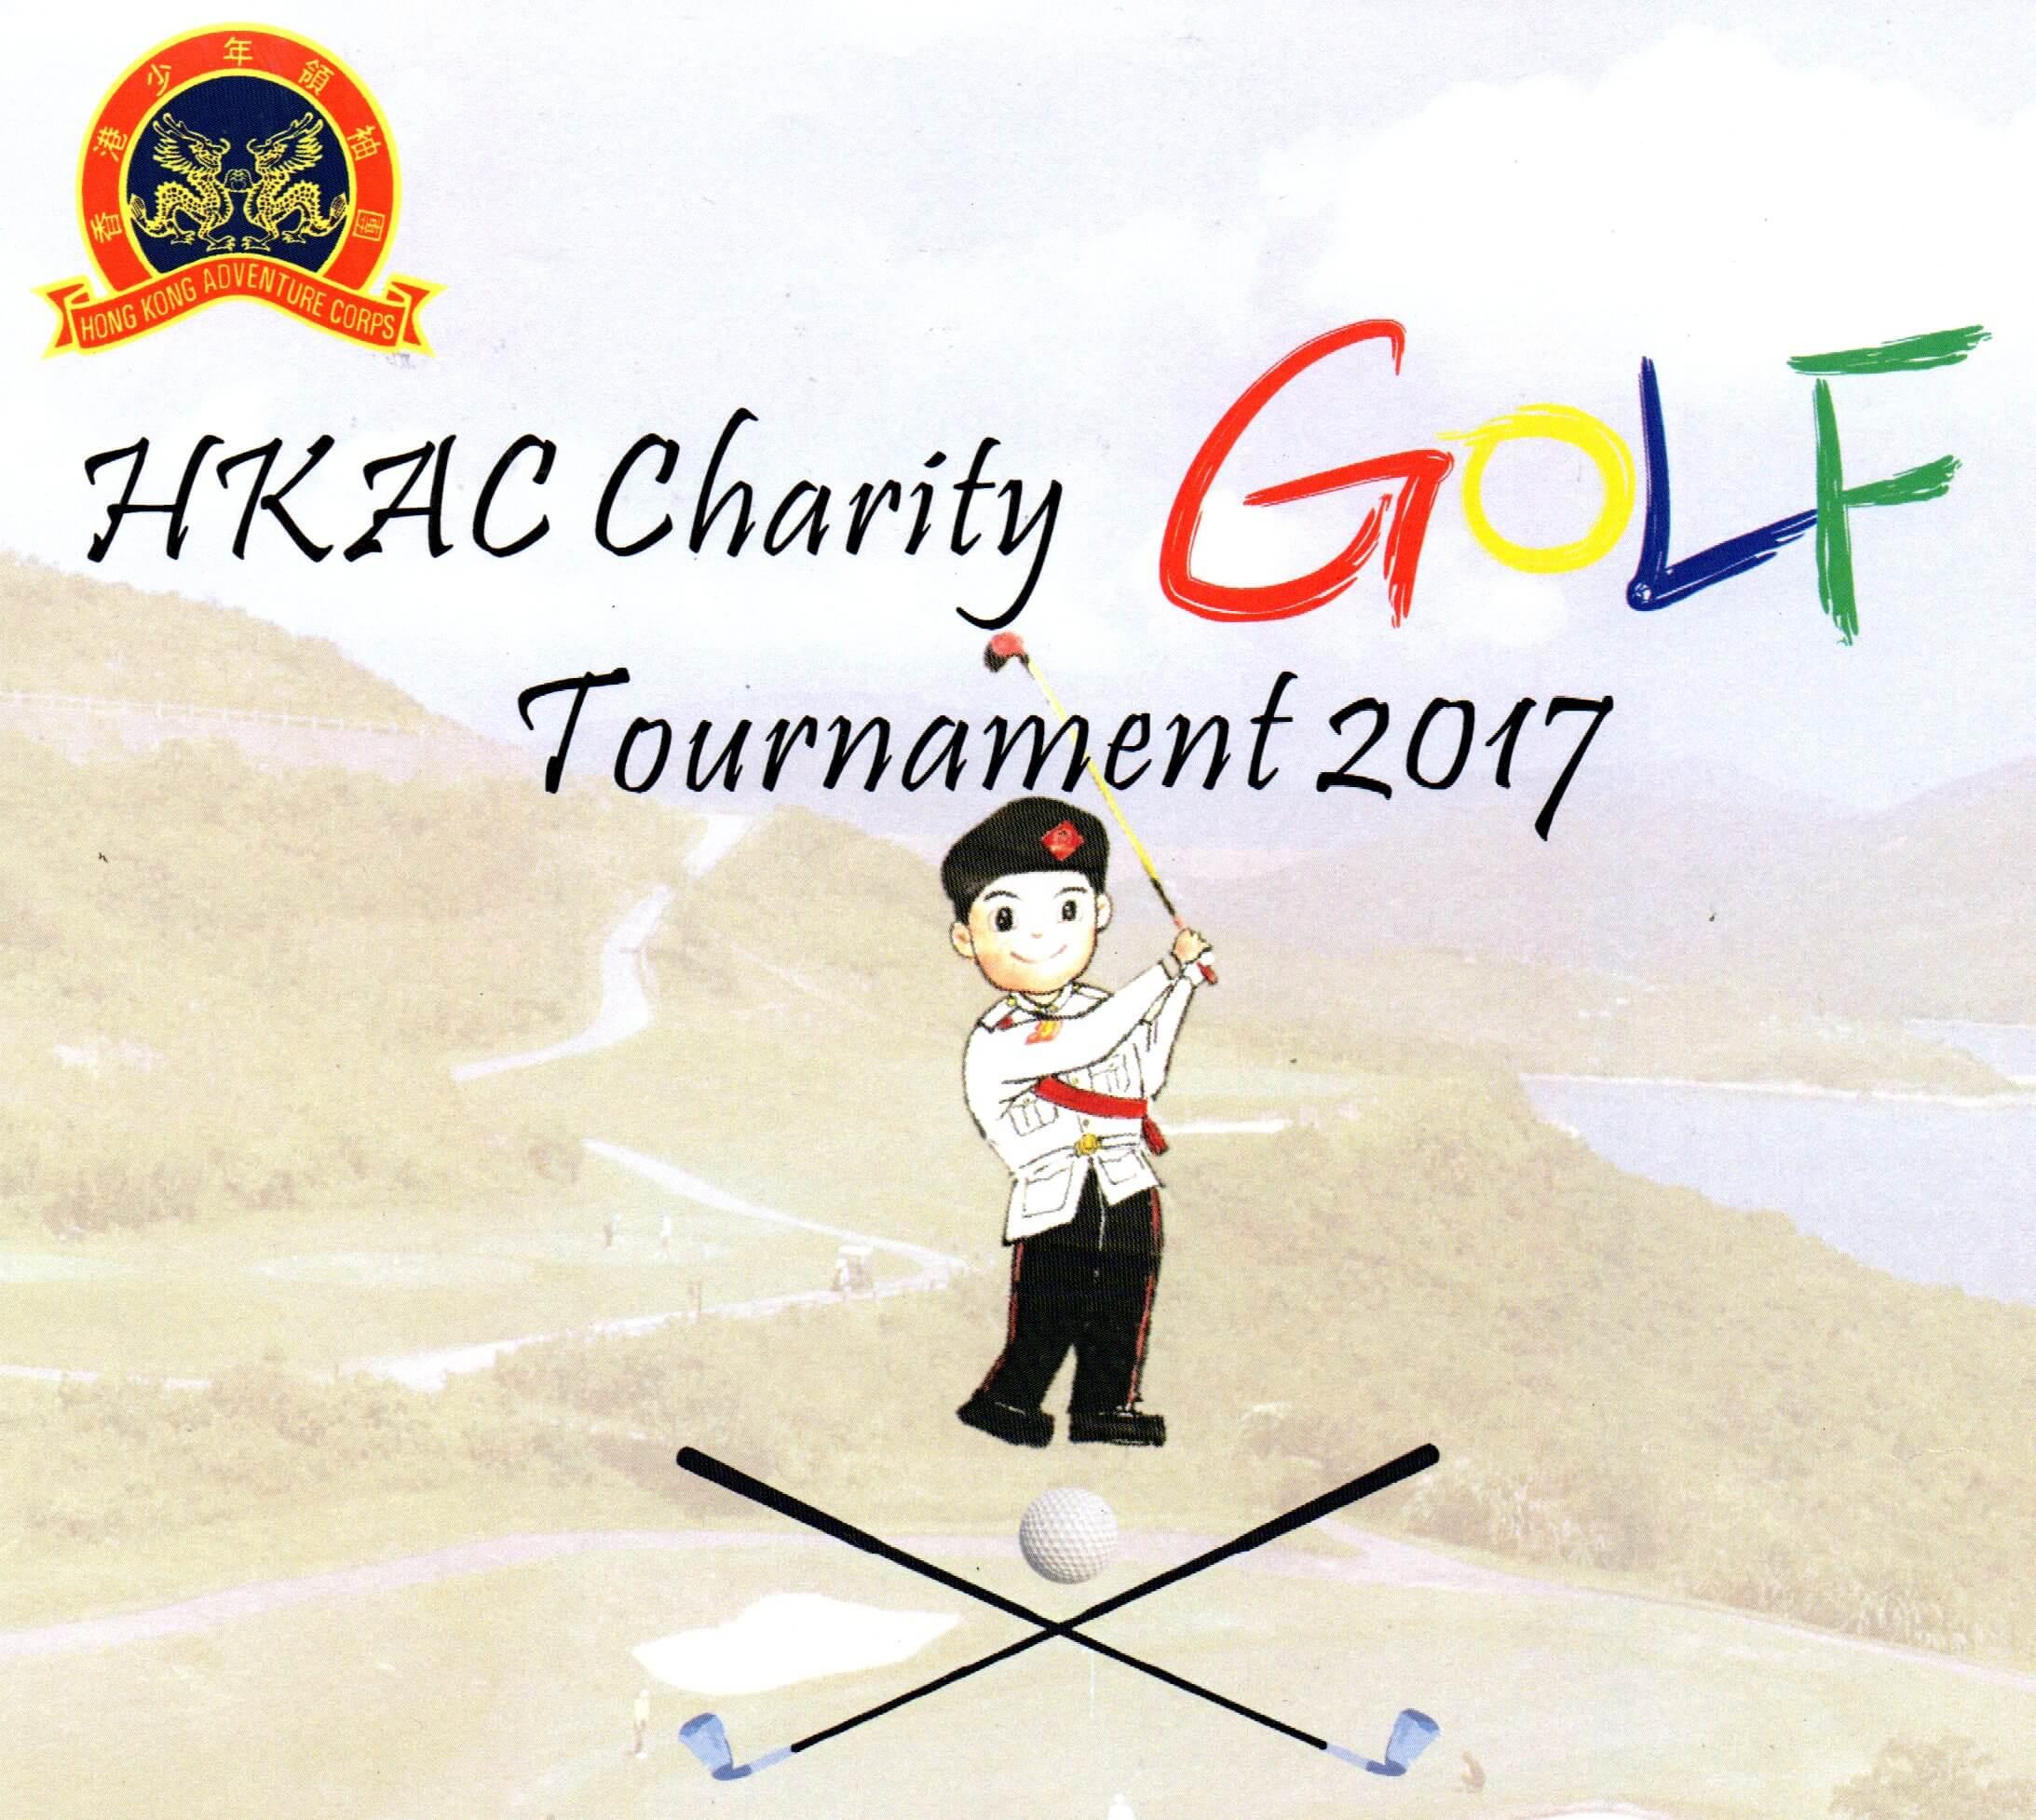 HKAC Charity Golf Tournament 2017